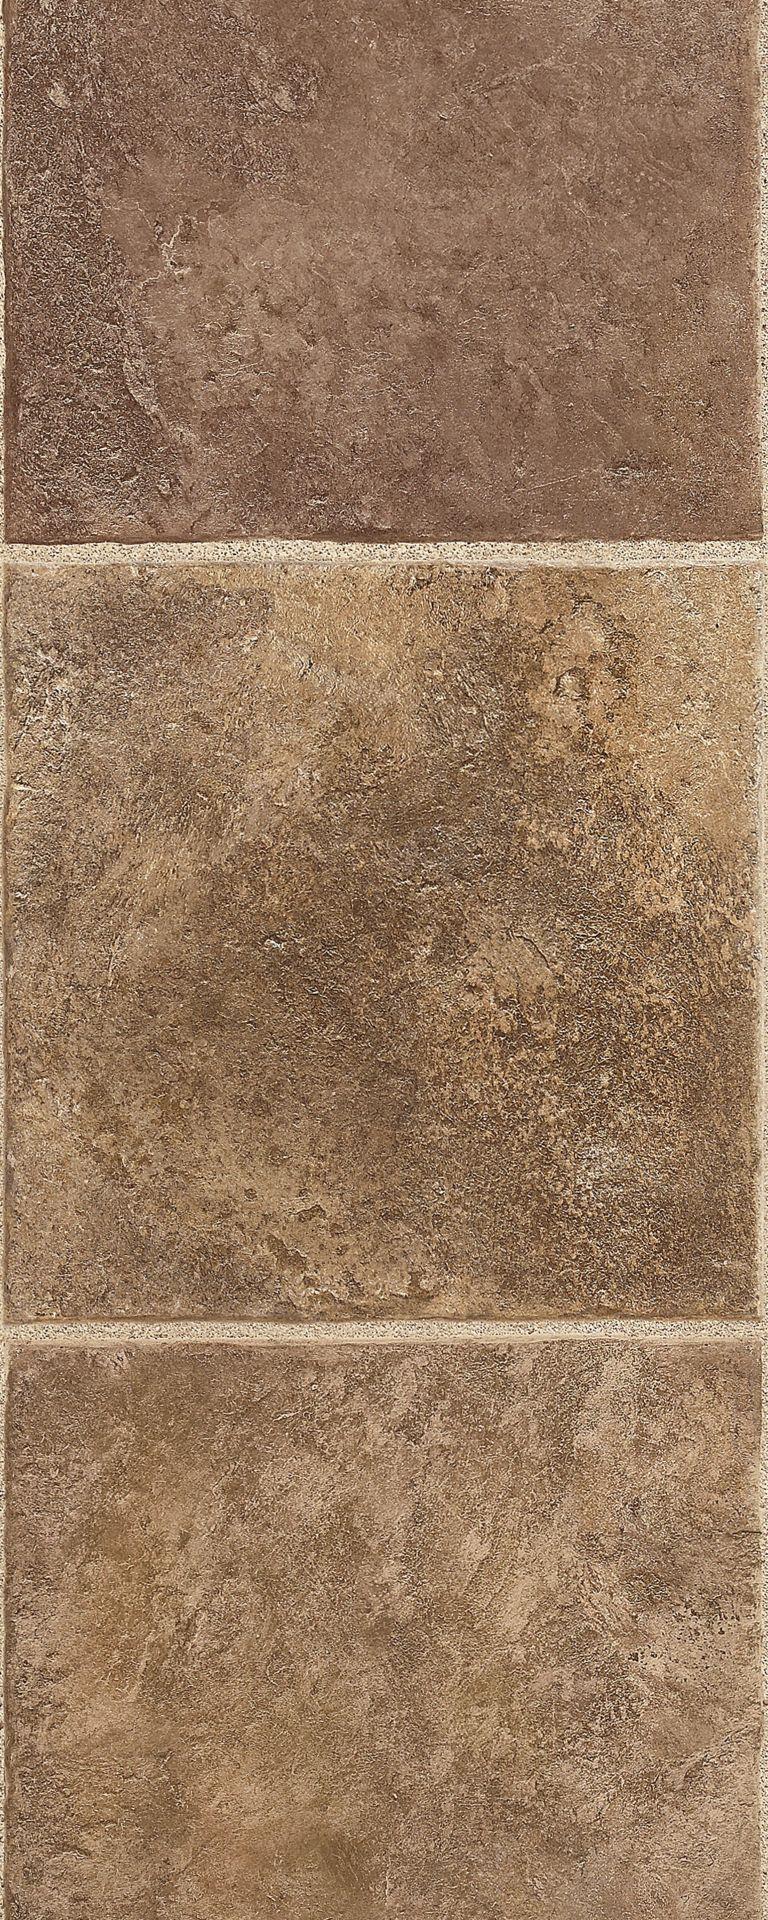 Peruvian Slate - River Sand Laminado L6080